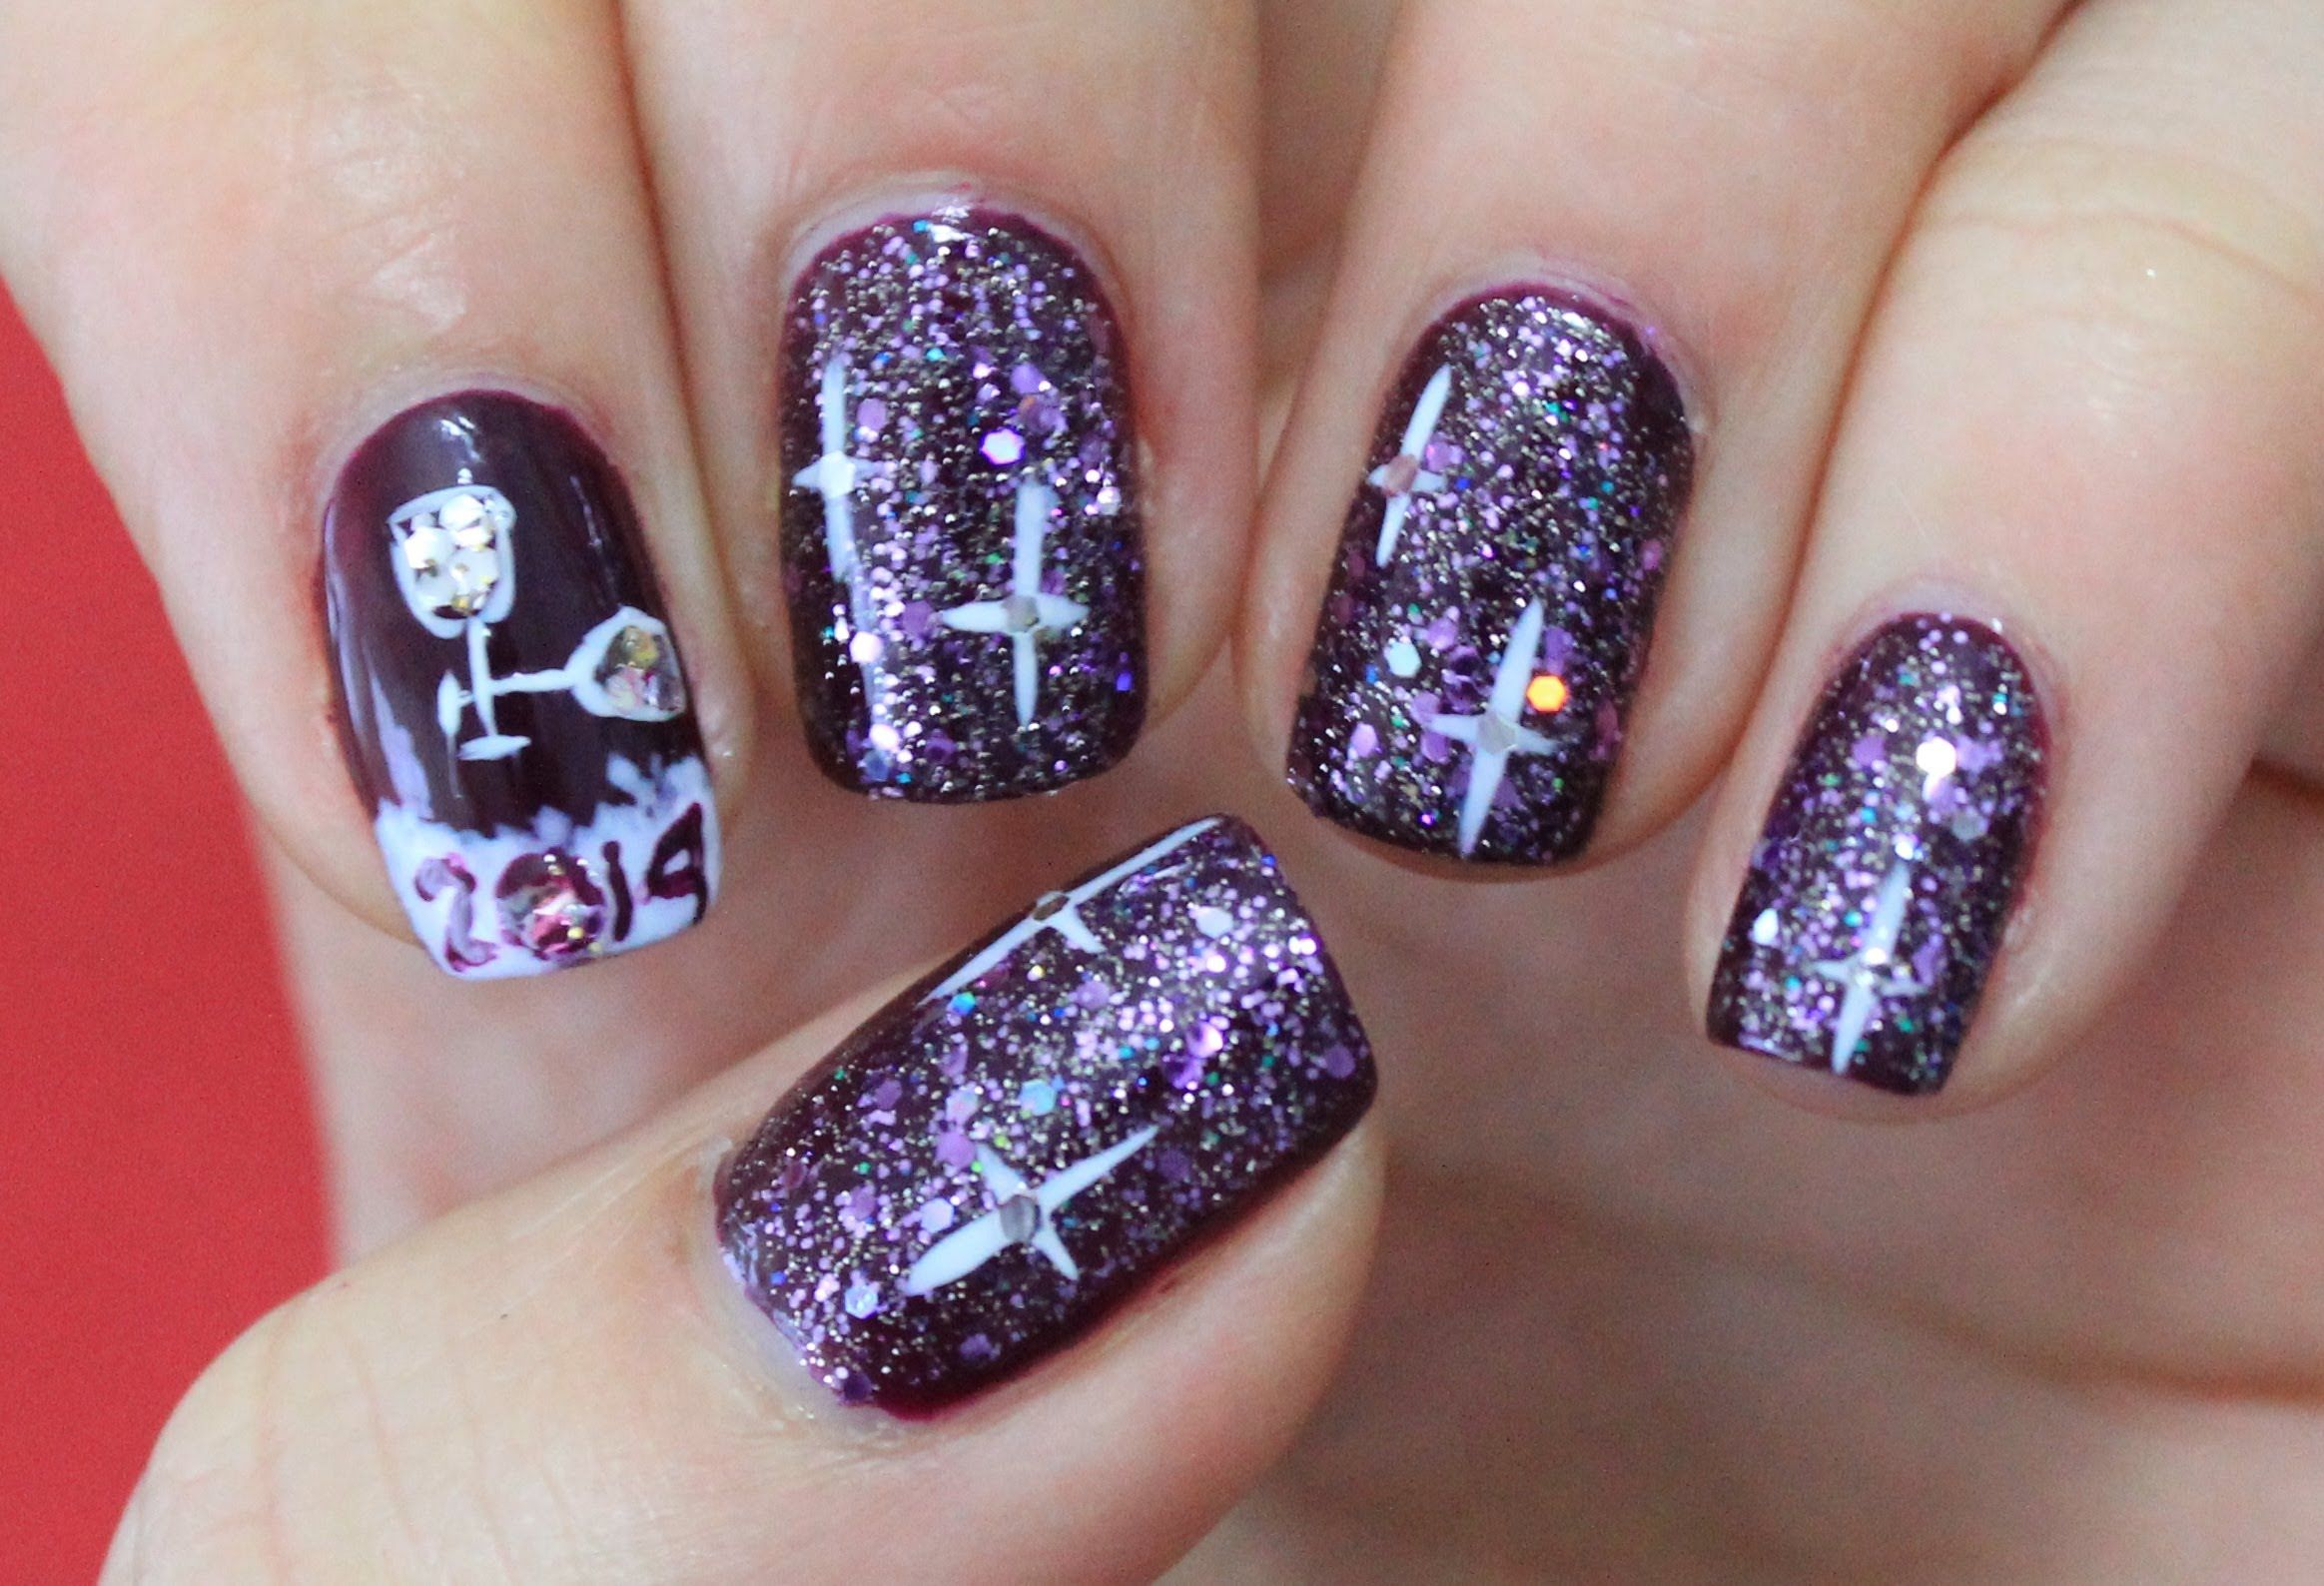 new year nailart 2014 | ∆∆Pretty Nails∆∆ | Pinterest | Pretty nails